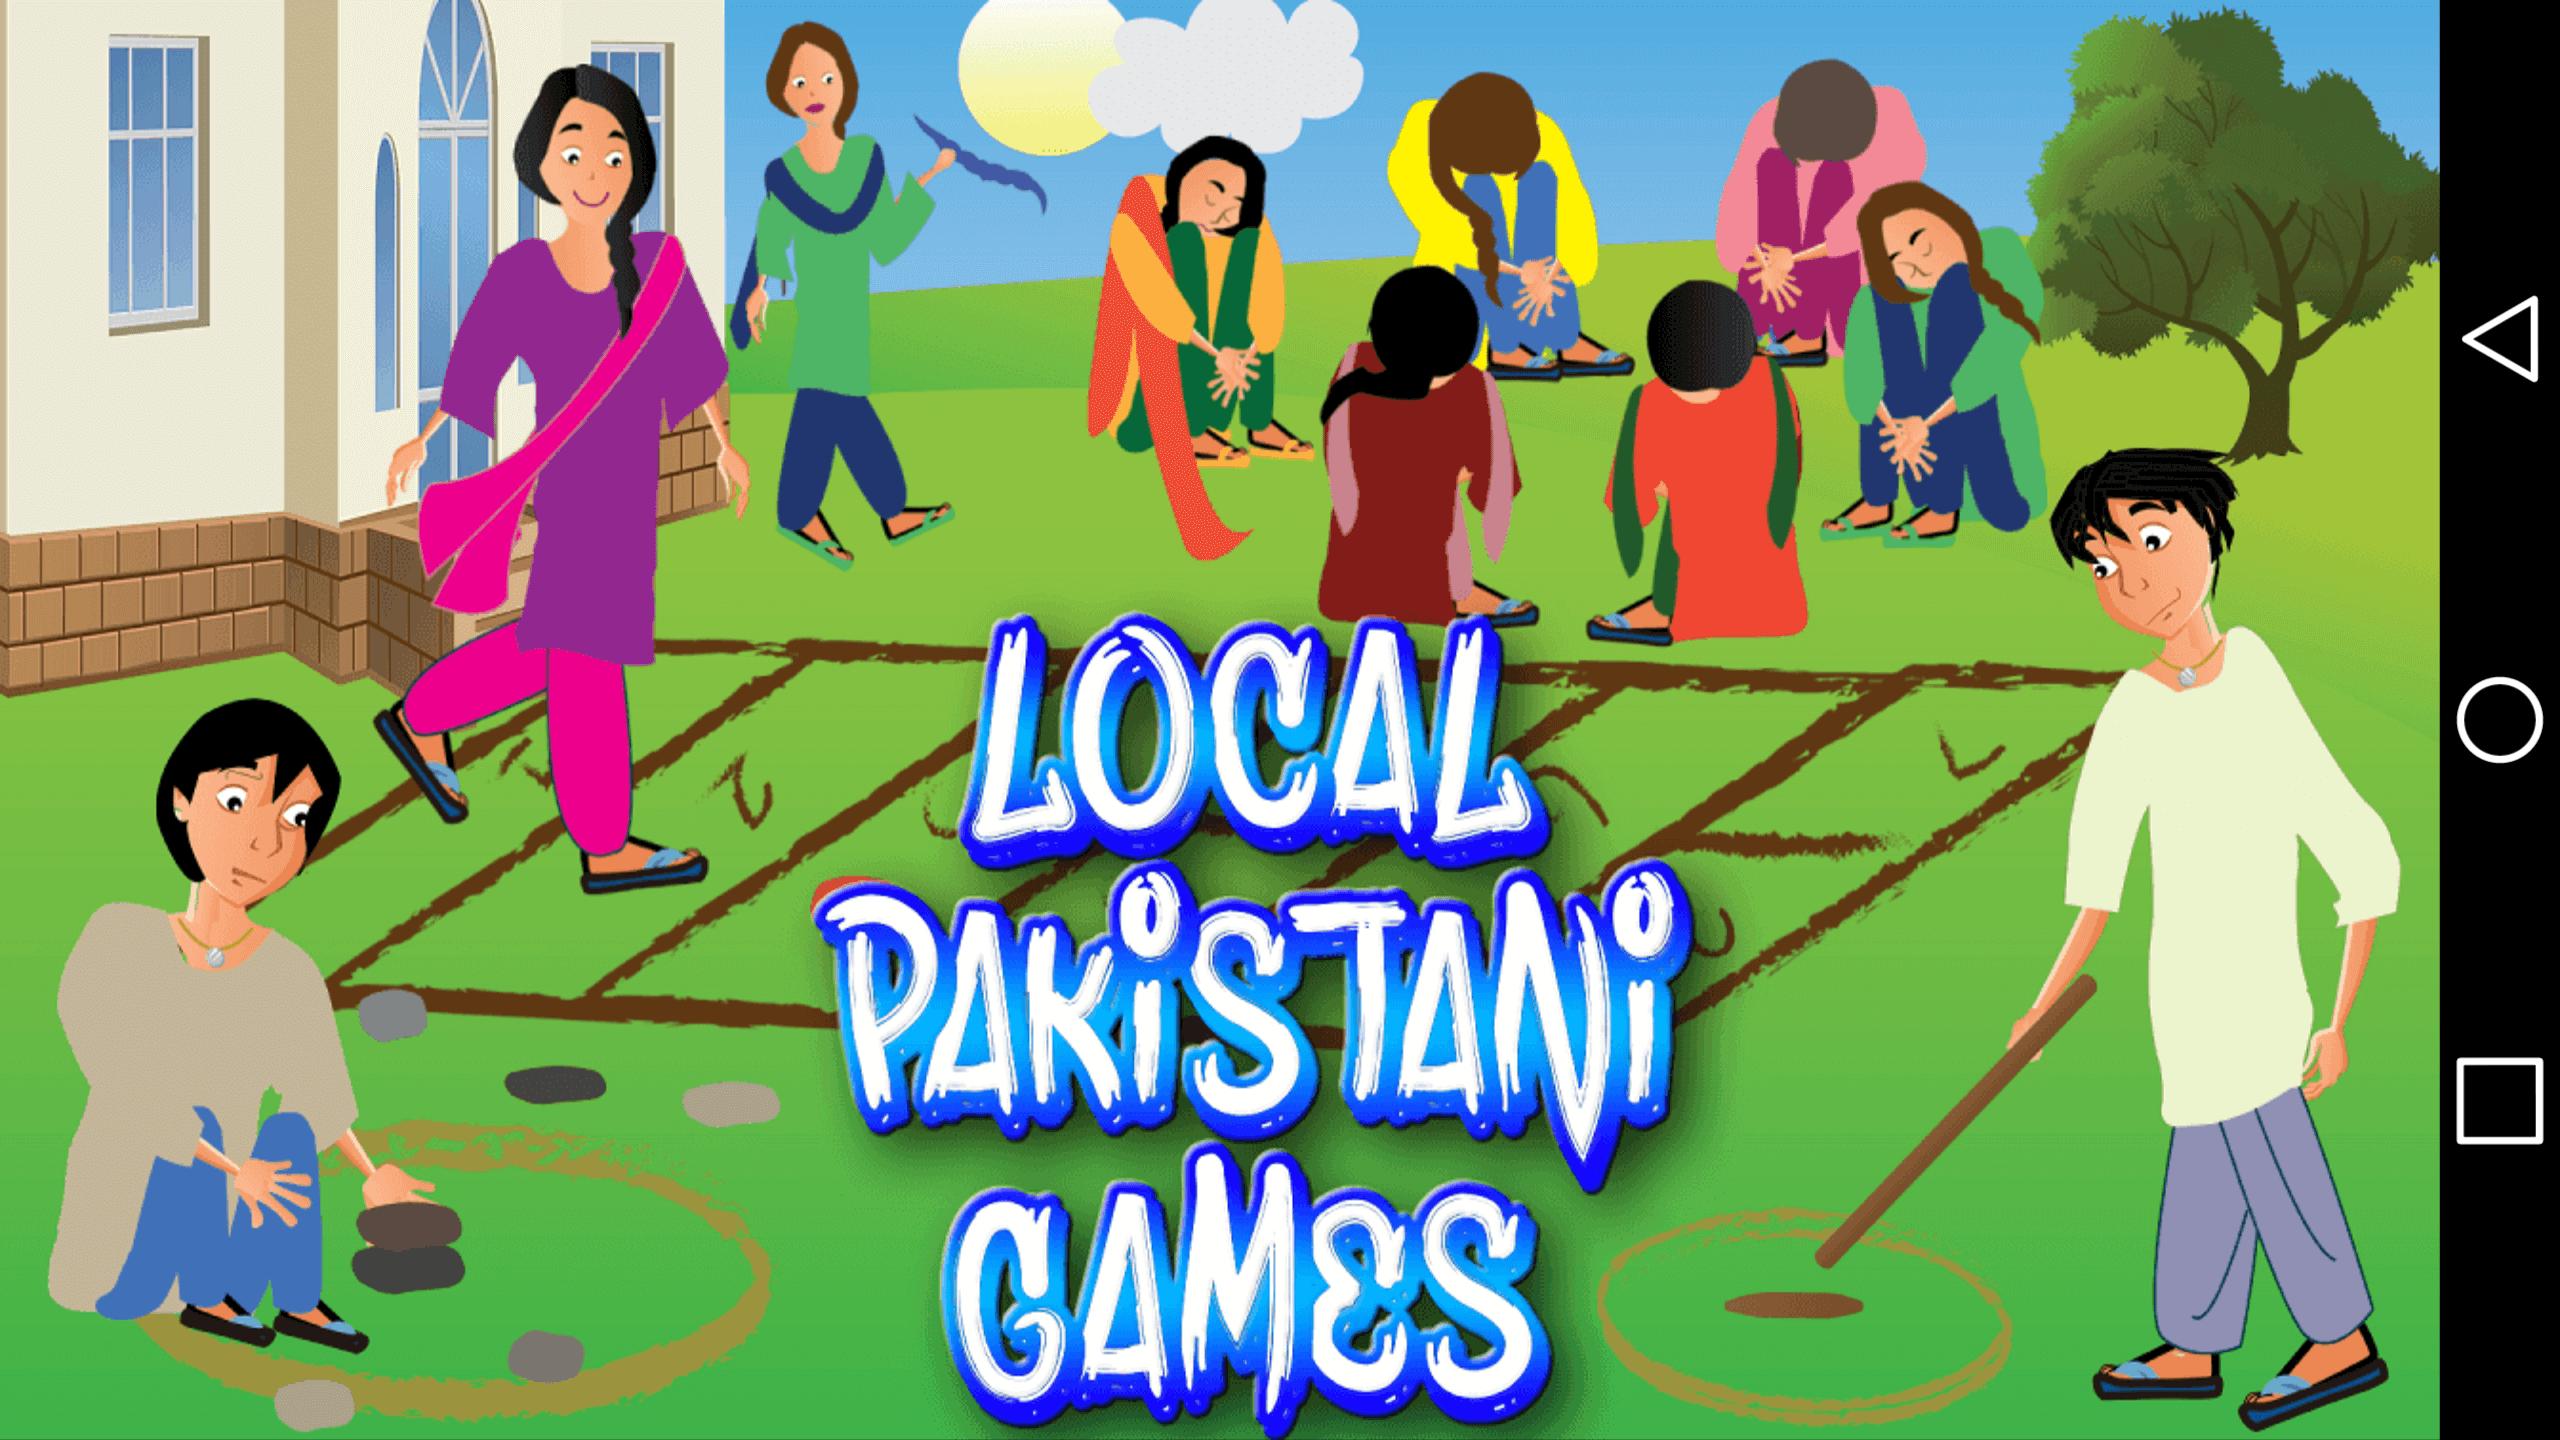 Local Pakistani Games